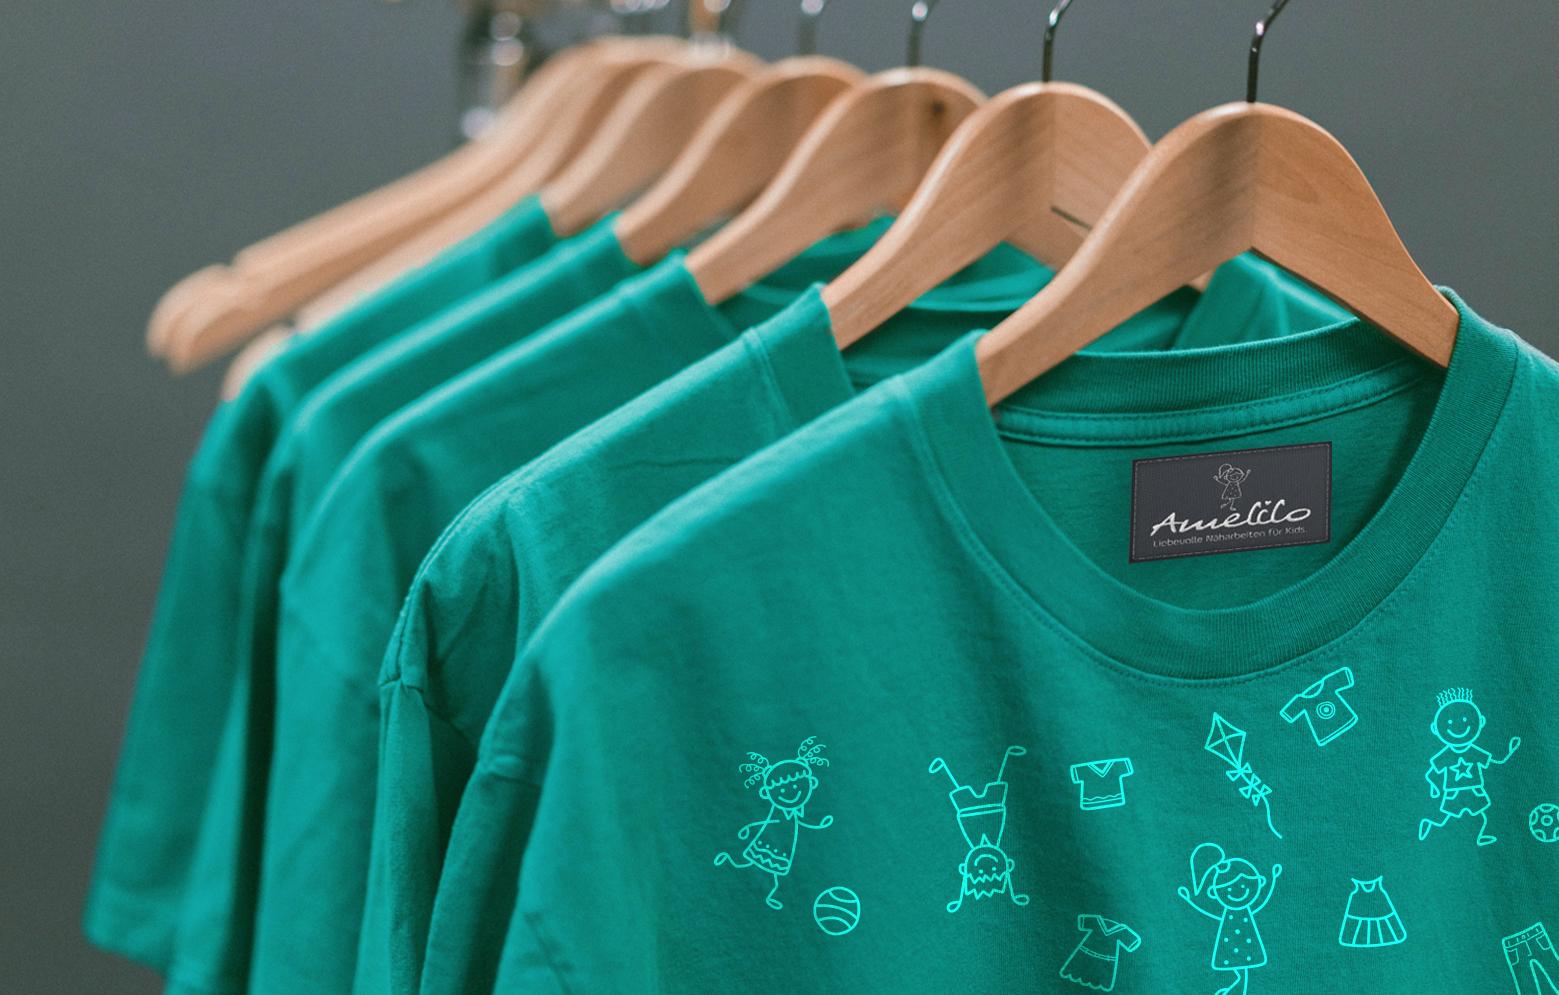 Amelilo T-Shirts